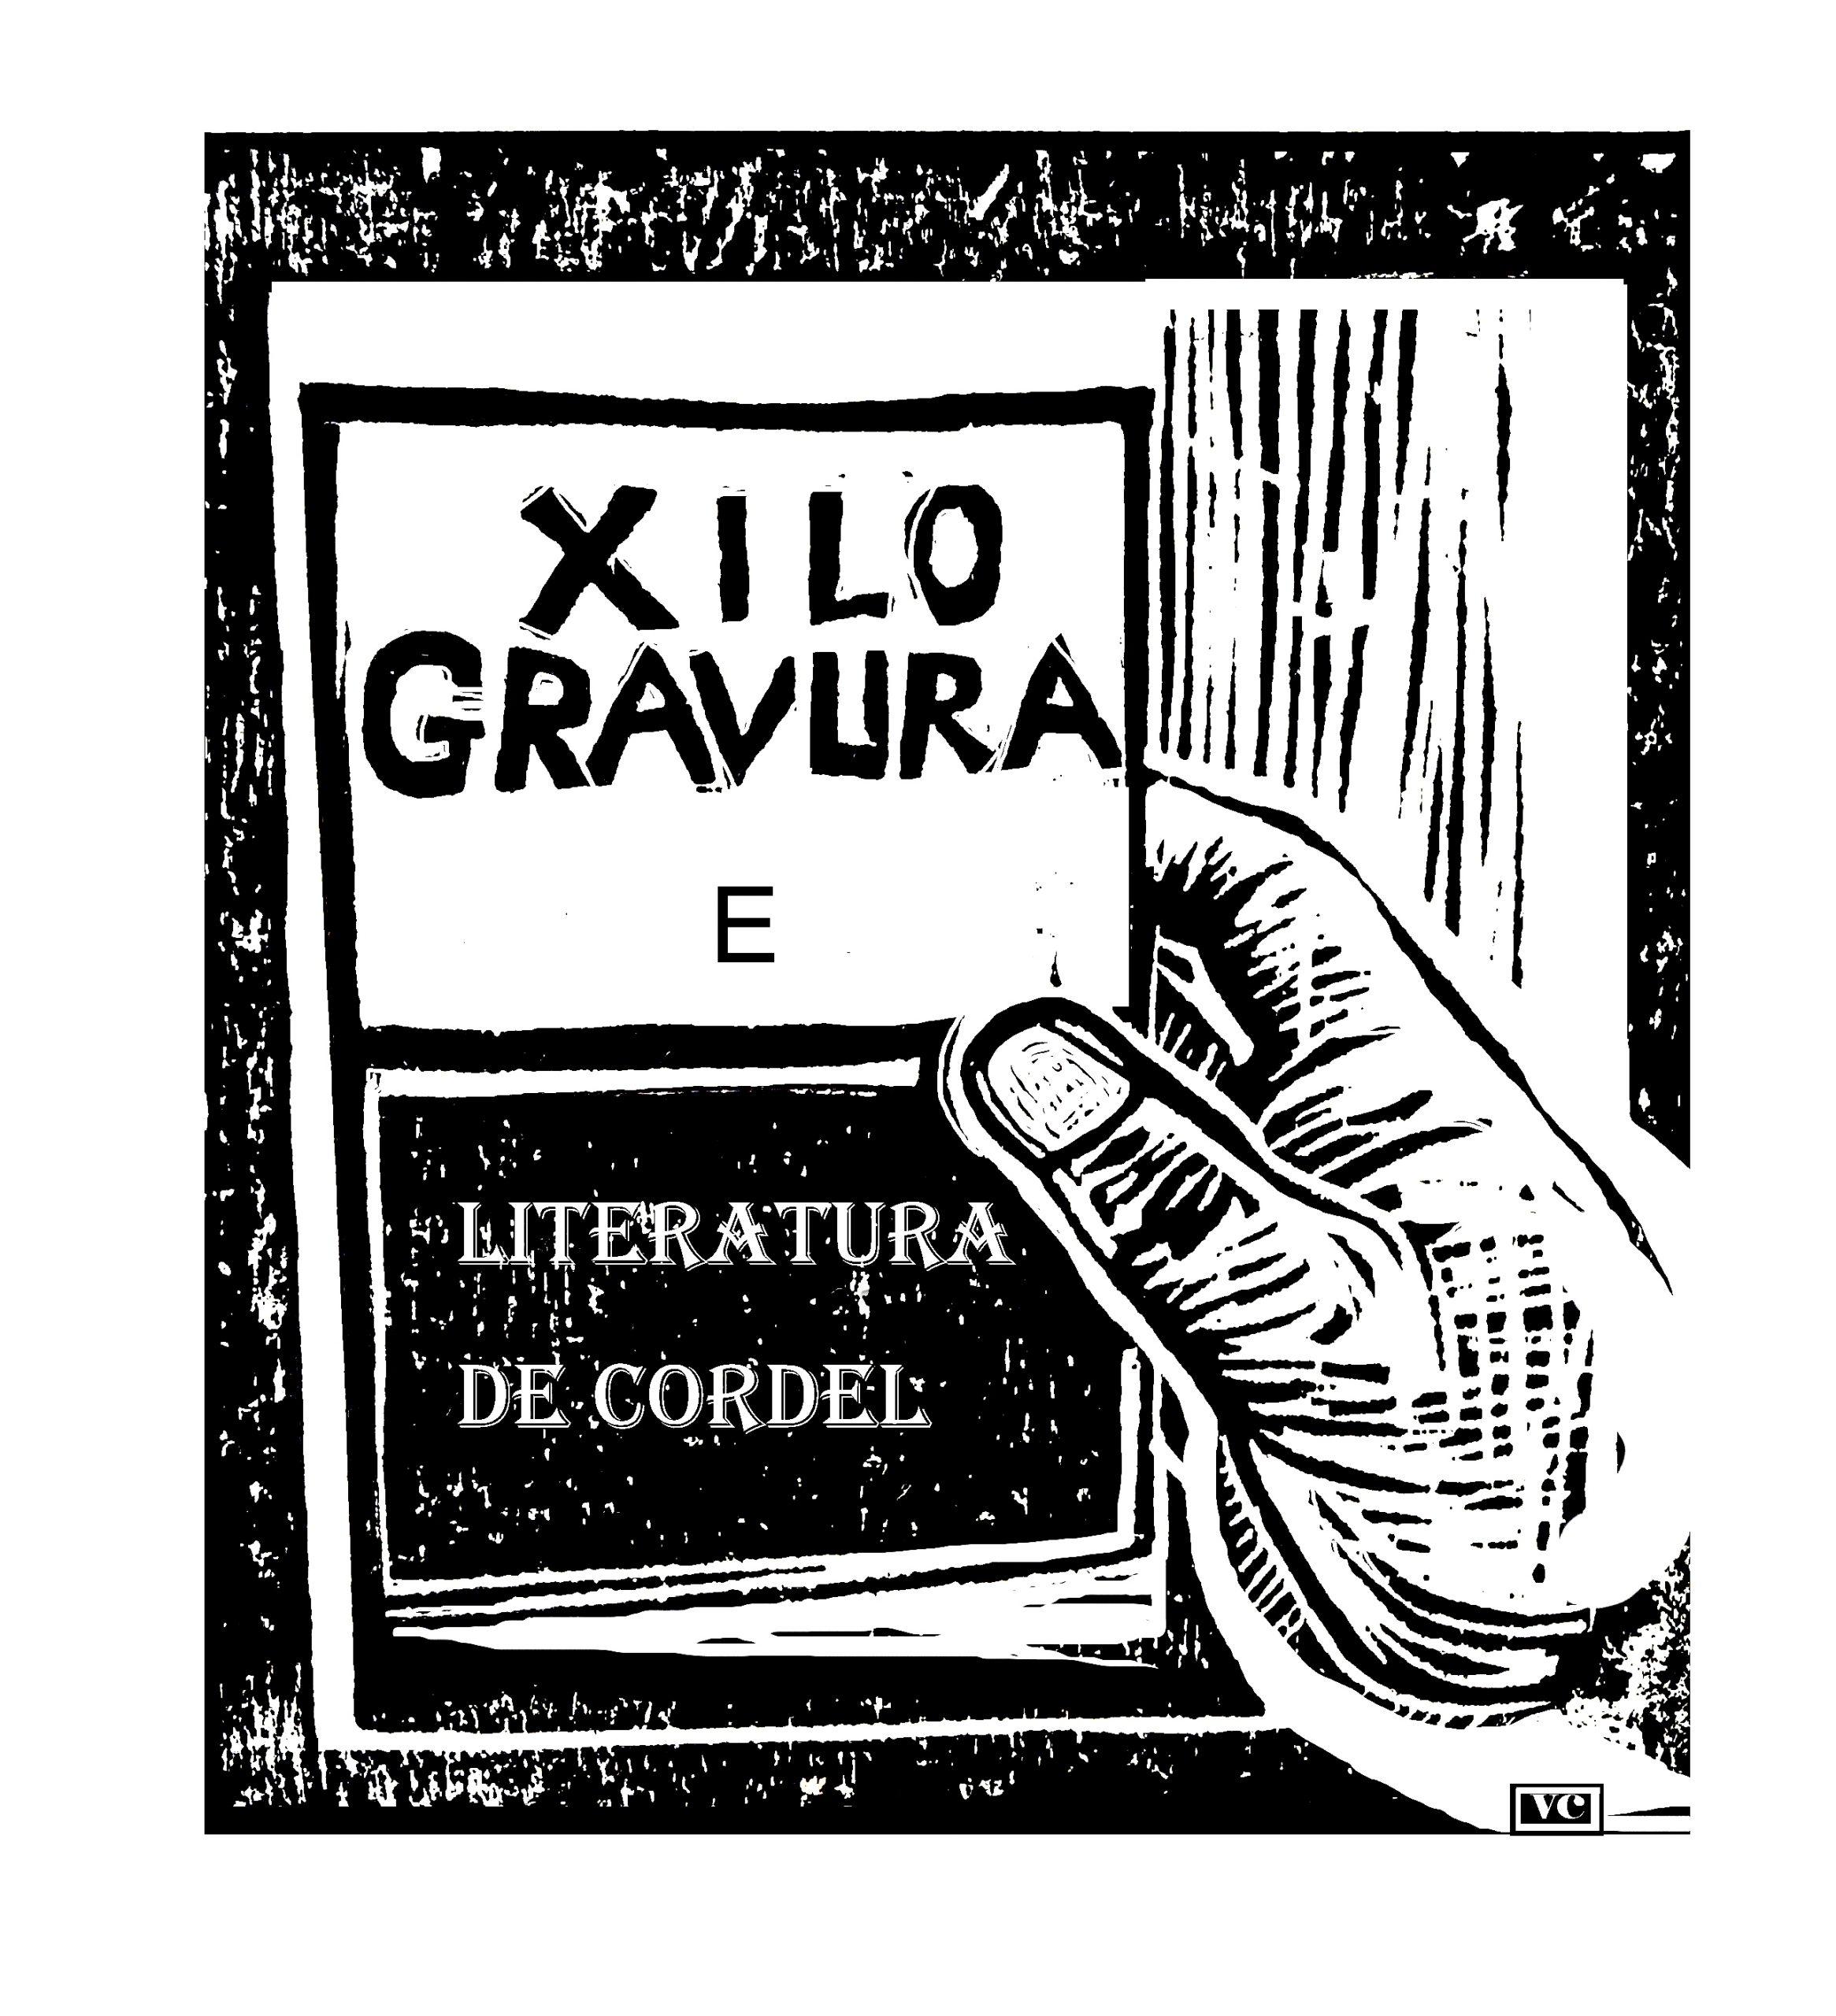 Xilogravura e Literatura de Cordel